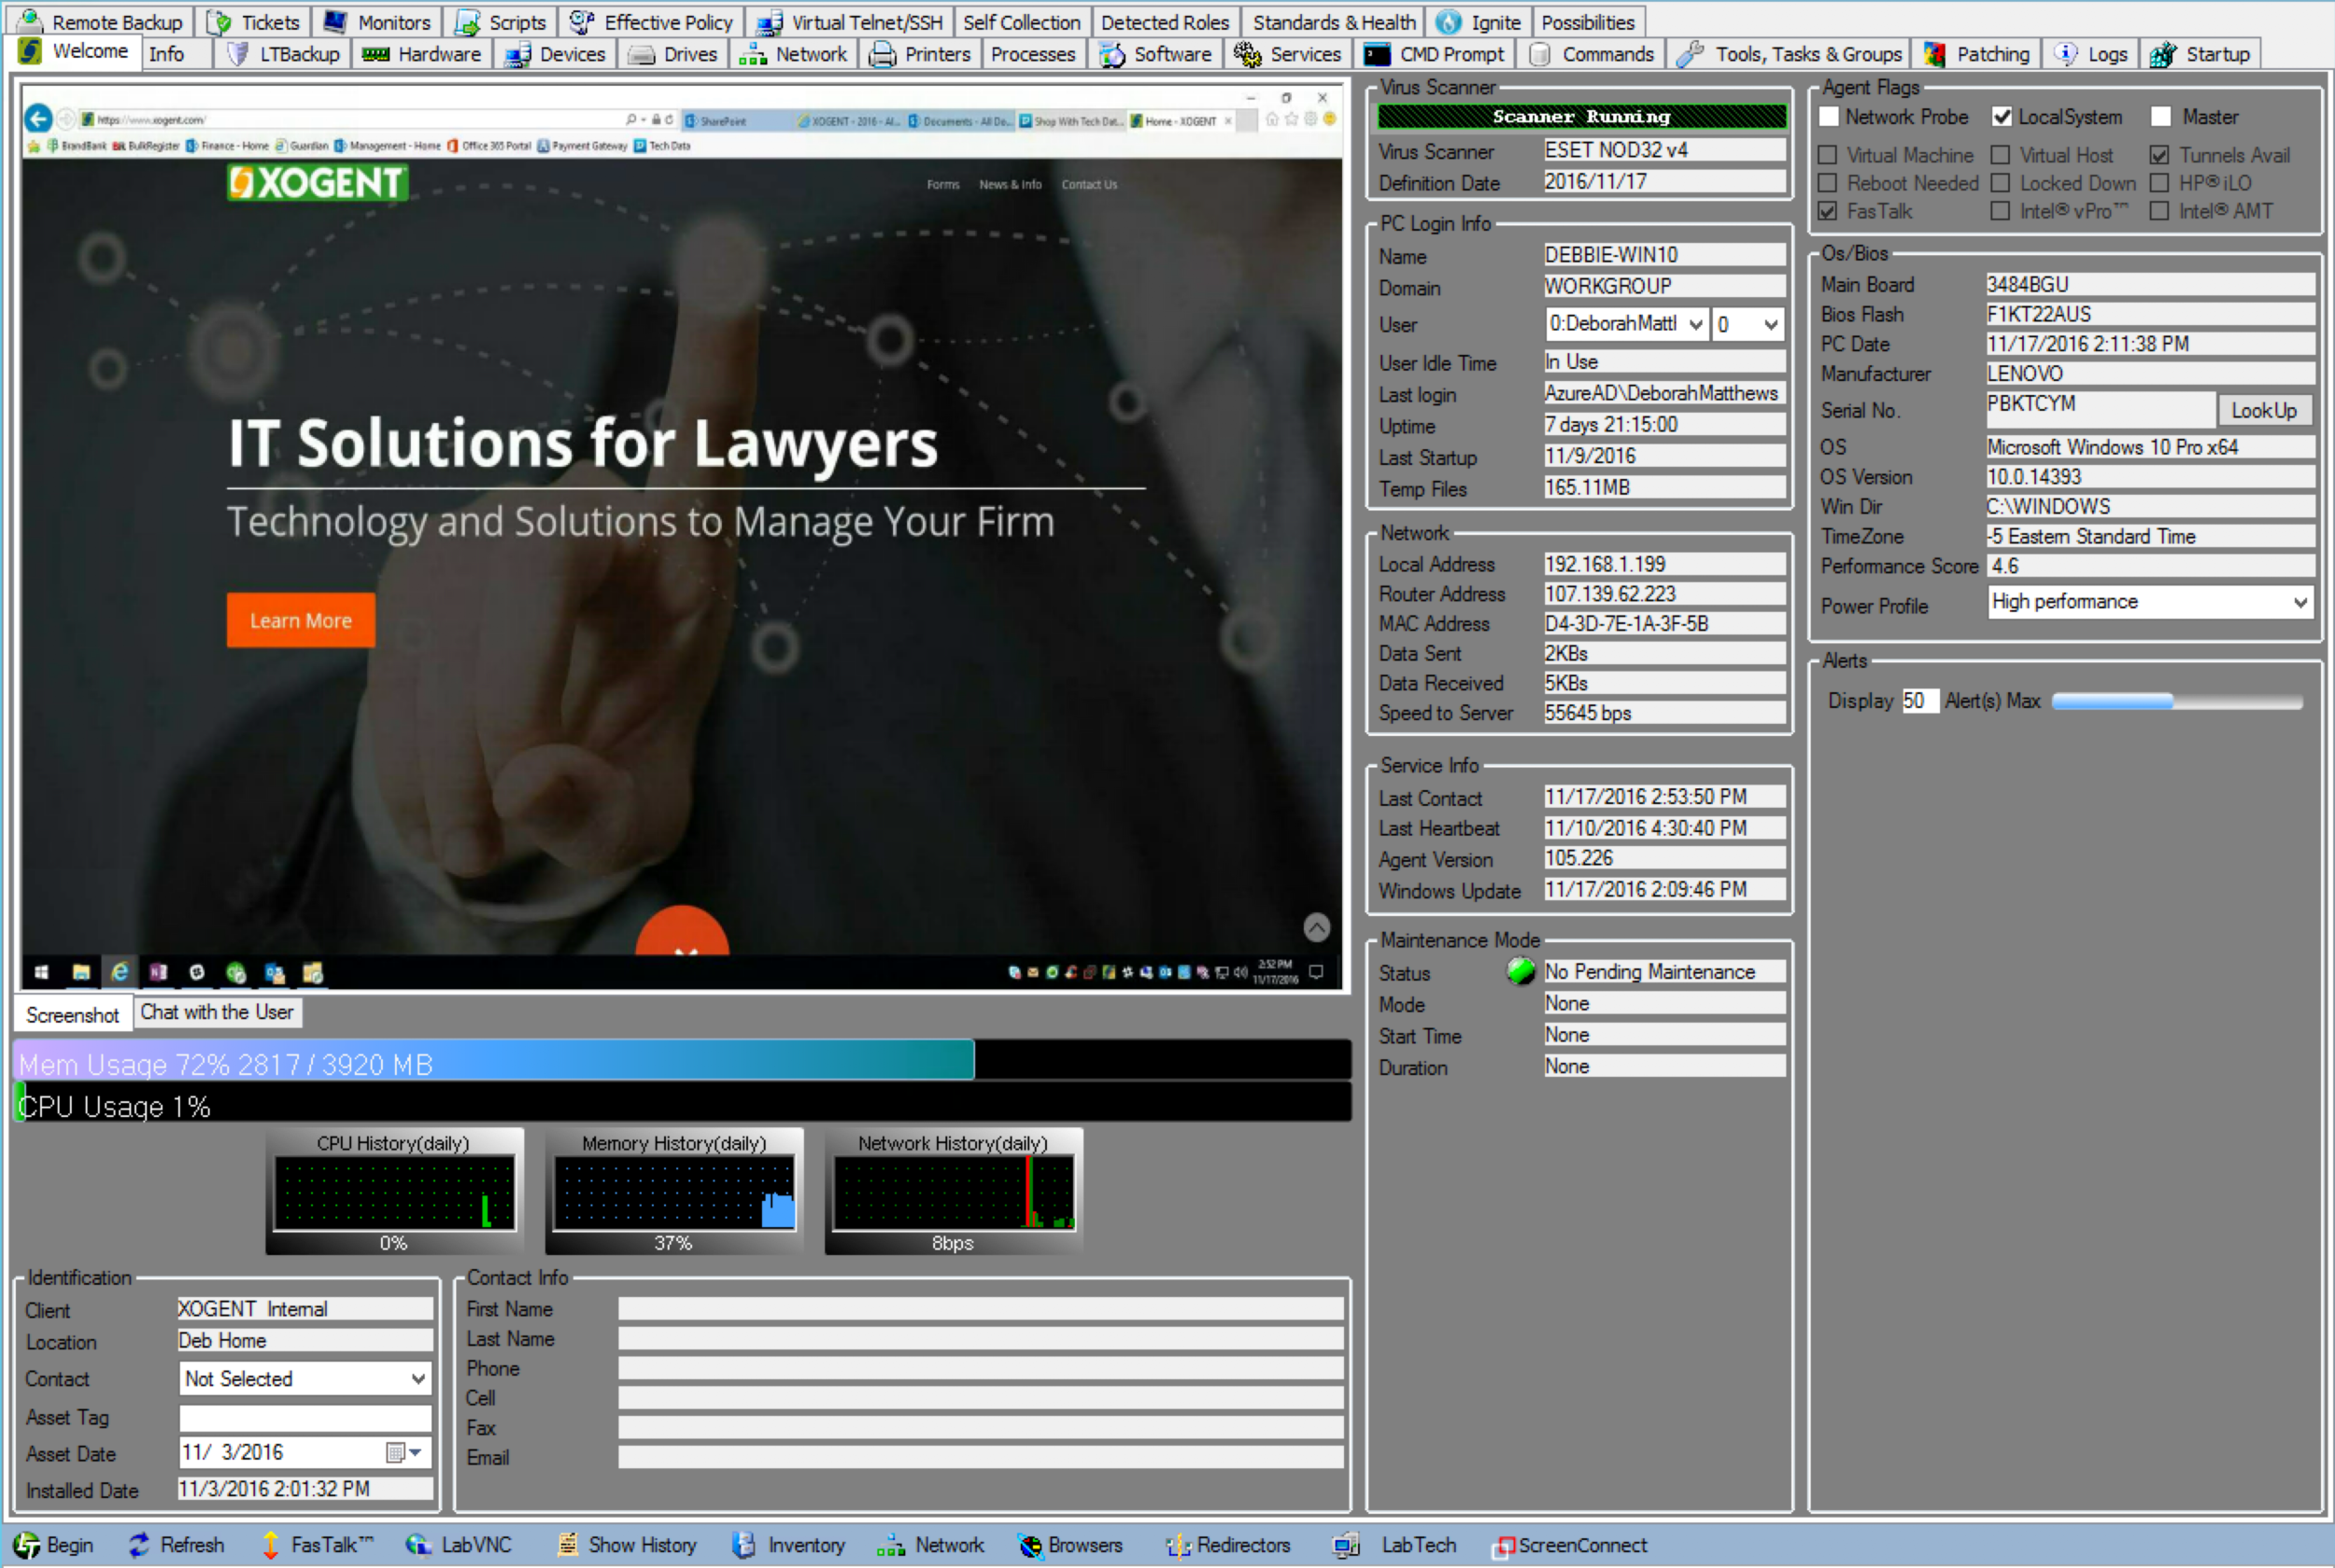 A screenshot of the H.A.L.O. computer management screen.